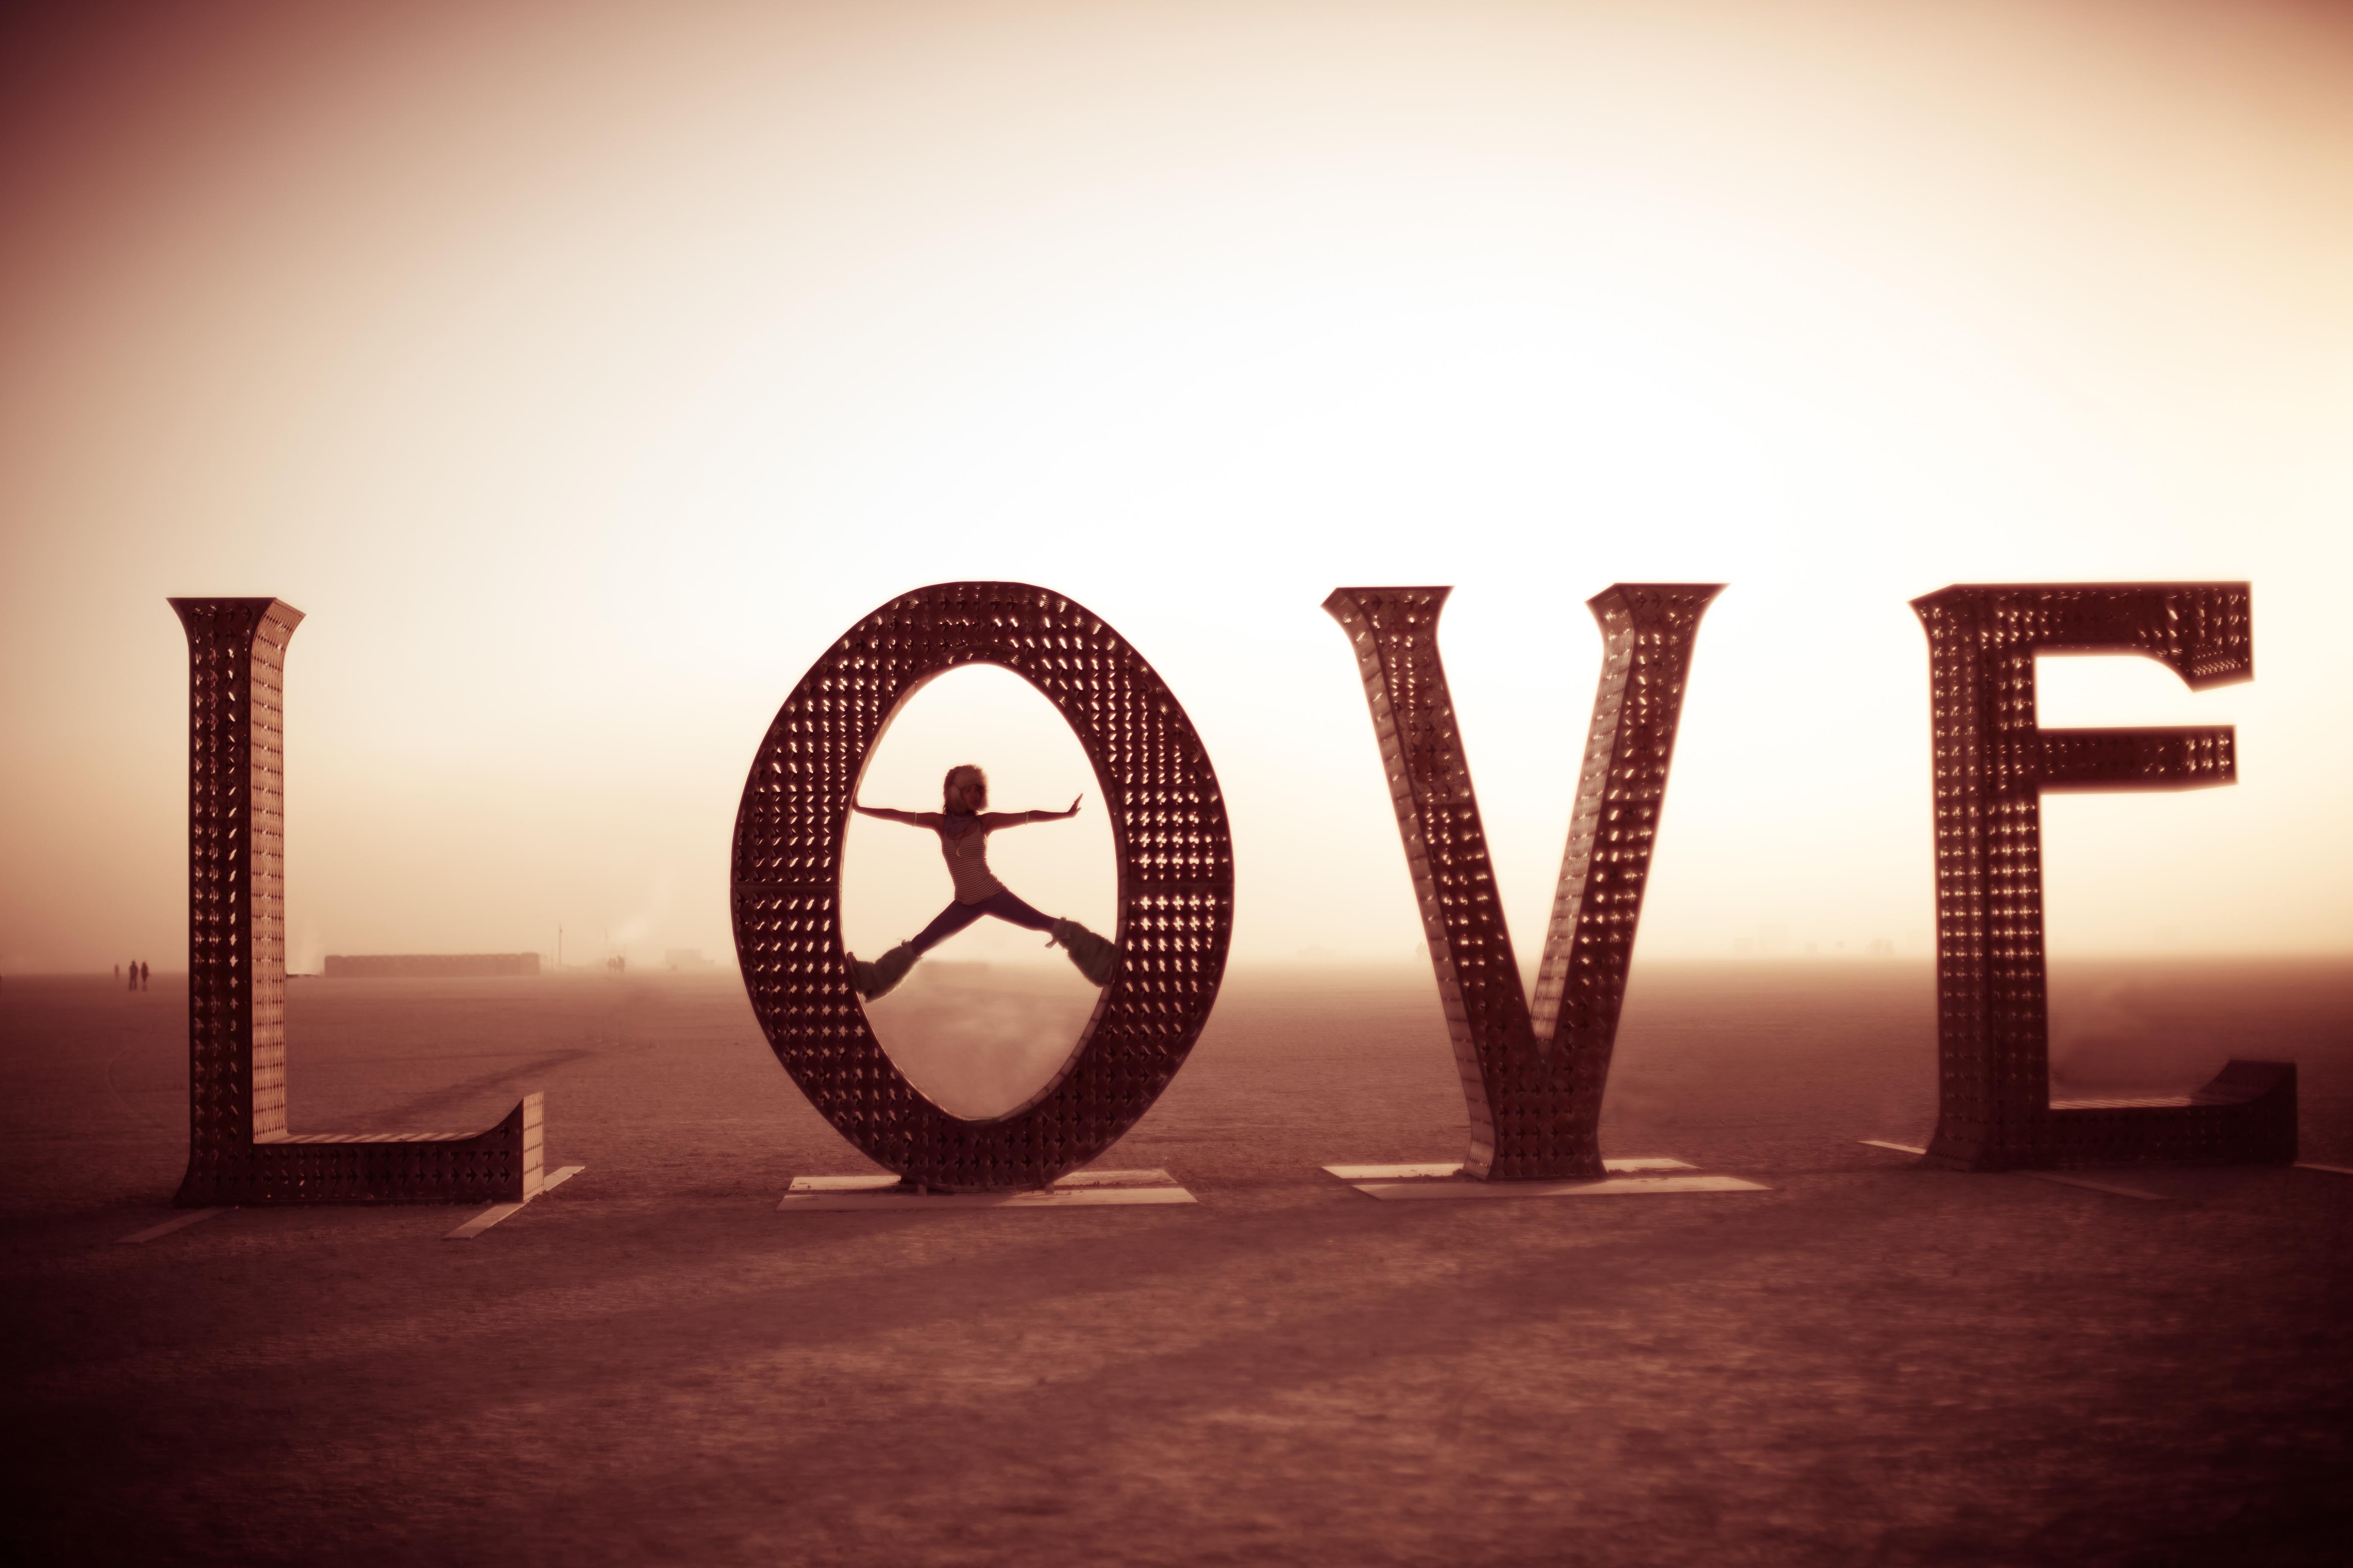 983Dusty Burning Love 2011